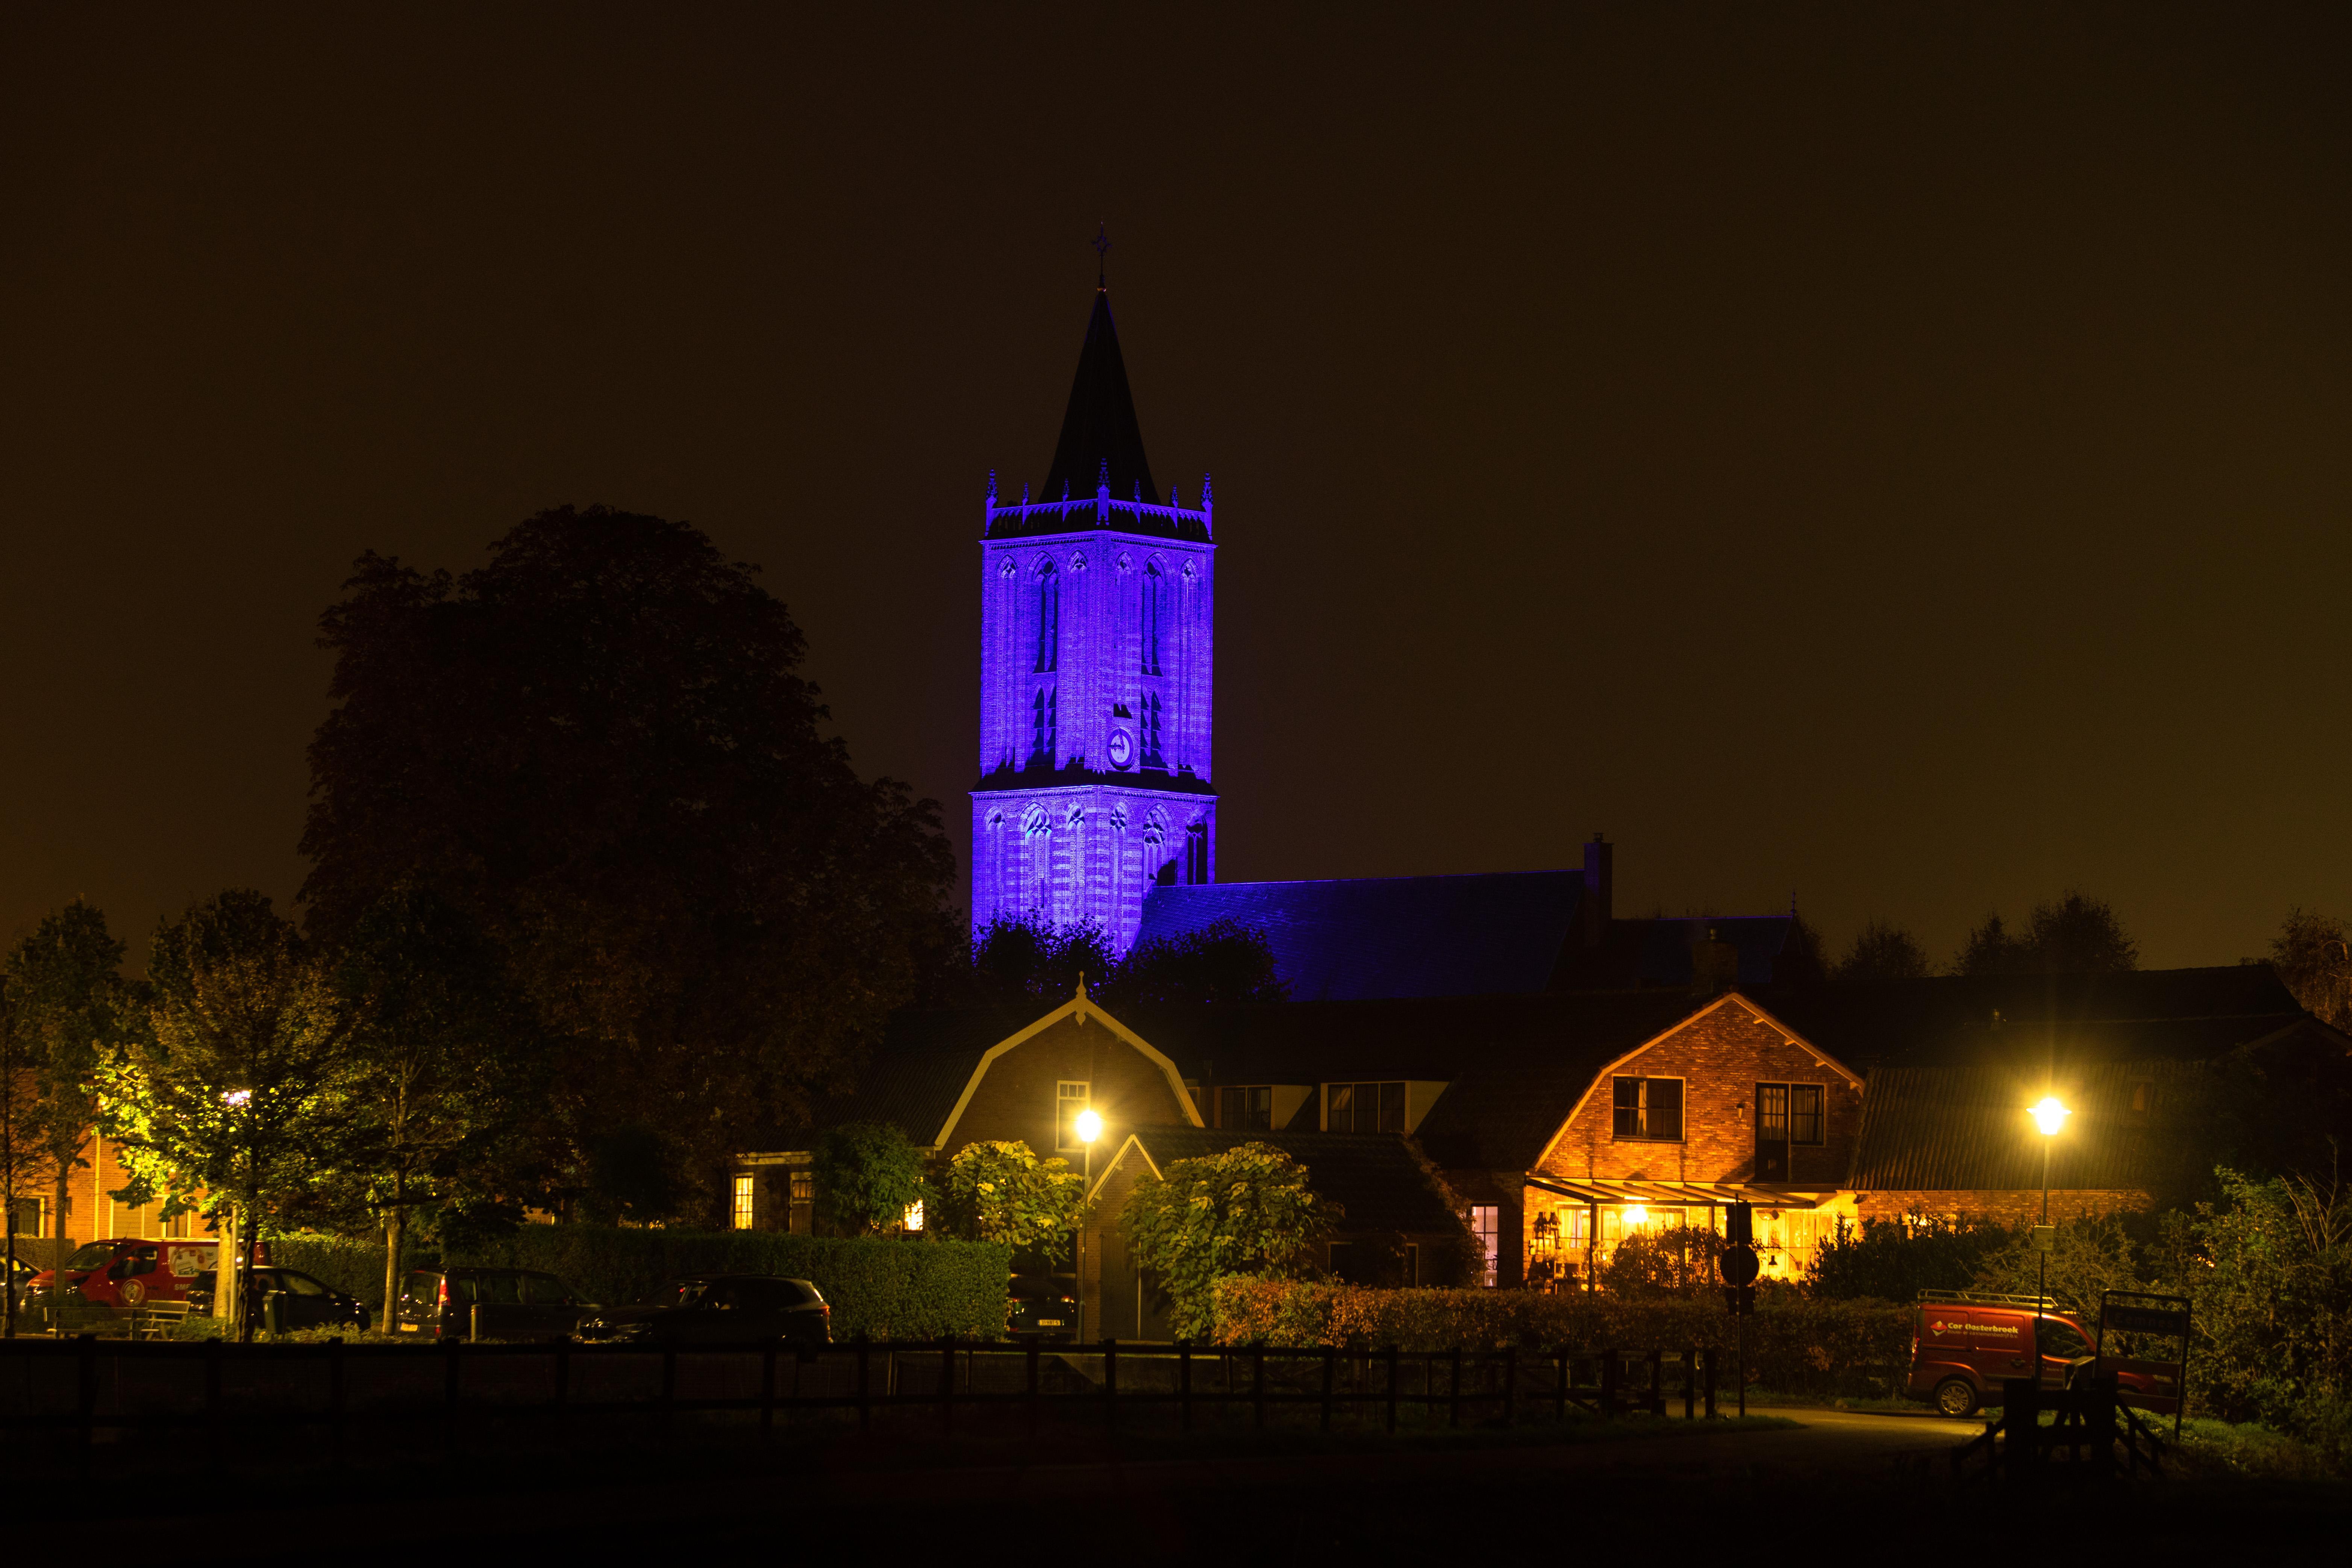 Kerk Eemnes in blauwe nachtpon voor 75ste verjaardag van de VN. In aanloop naar feestje in Vredespaleis